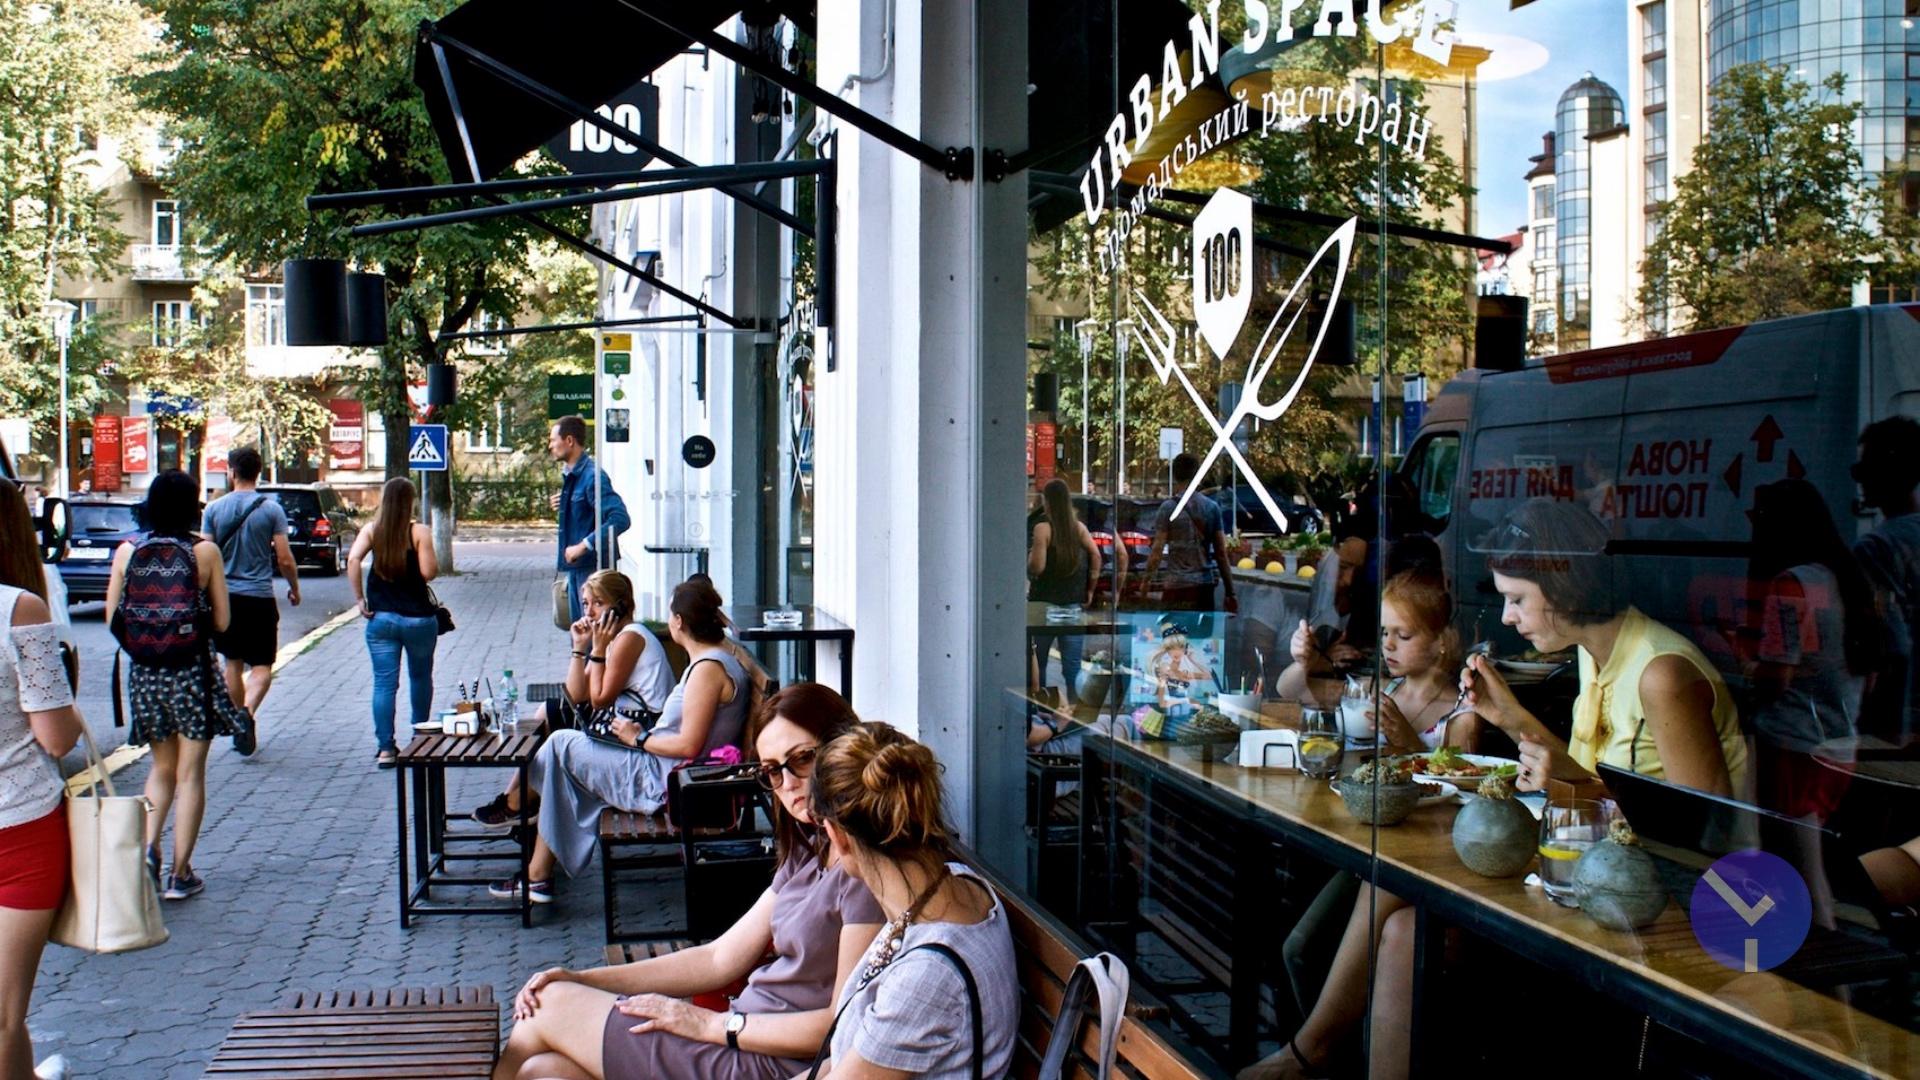 Ideja, restoran, radiostancija, zmina sensiv — ščo take Urban Space